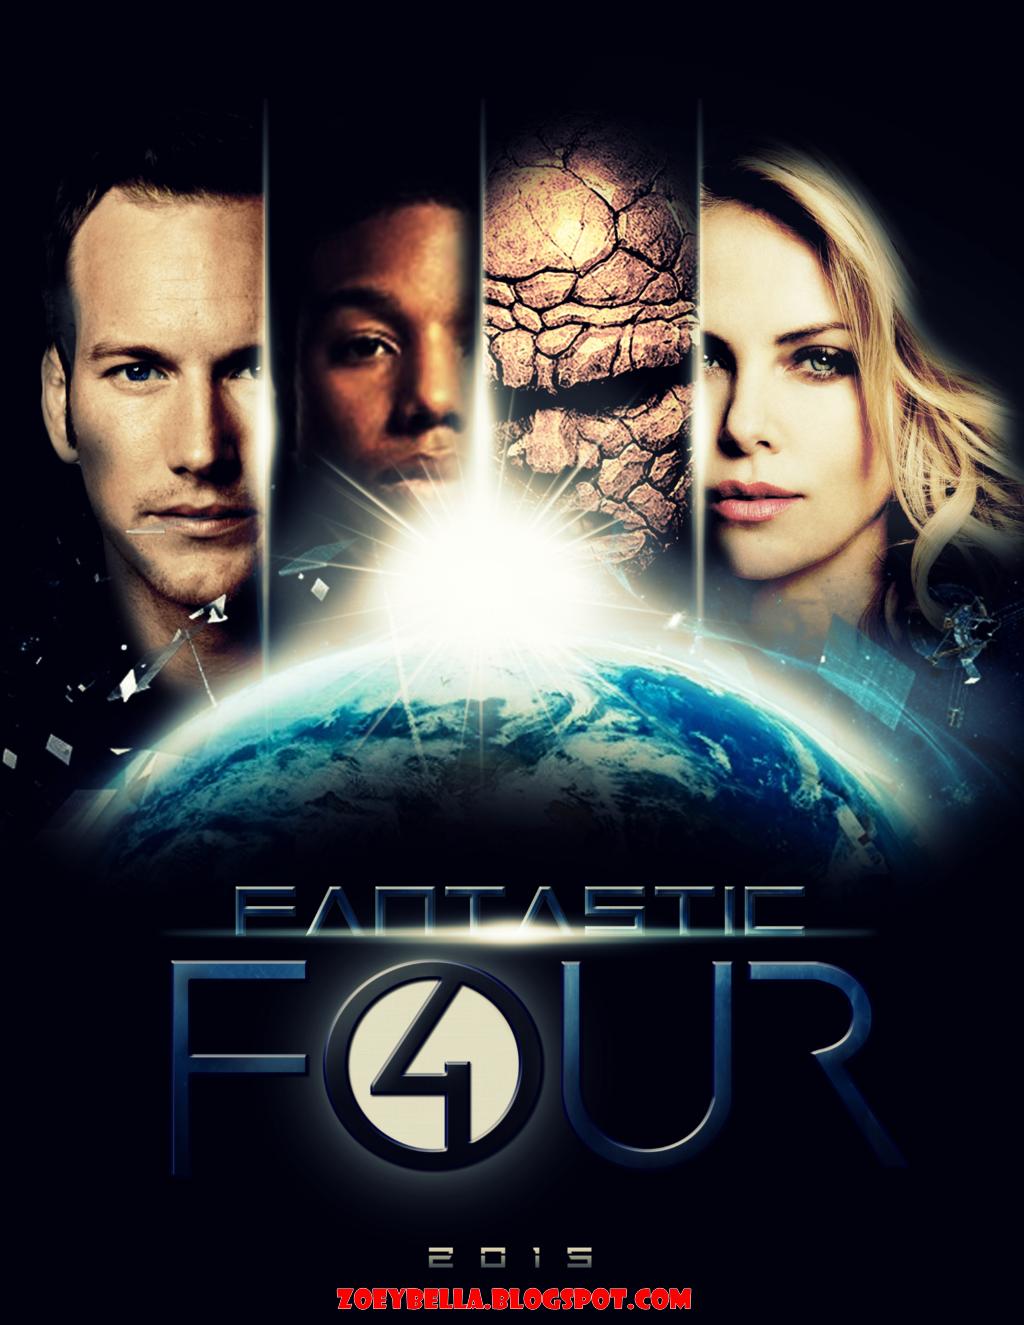 Download Film The Fantastic Four 2015 Subtitle Indonesia